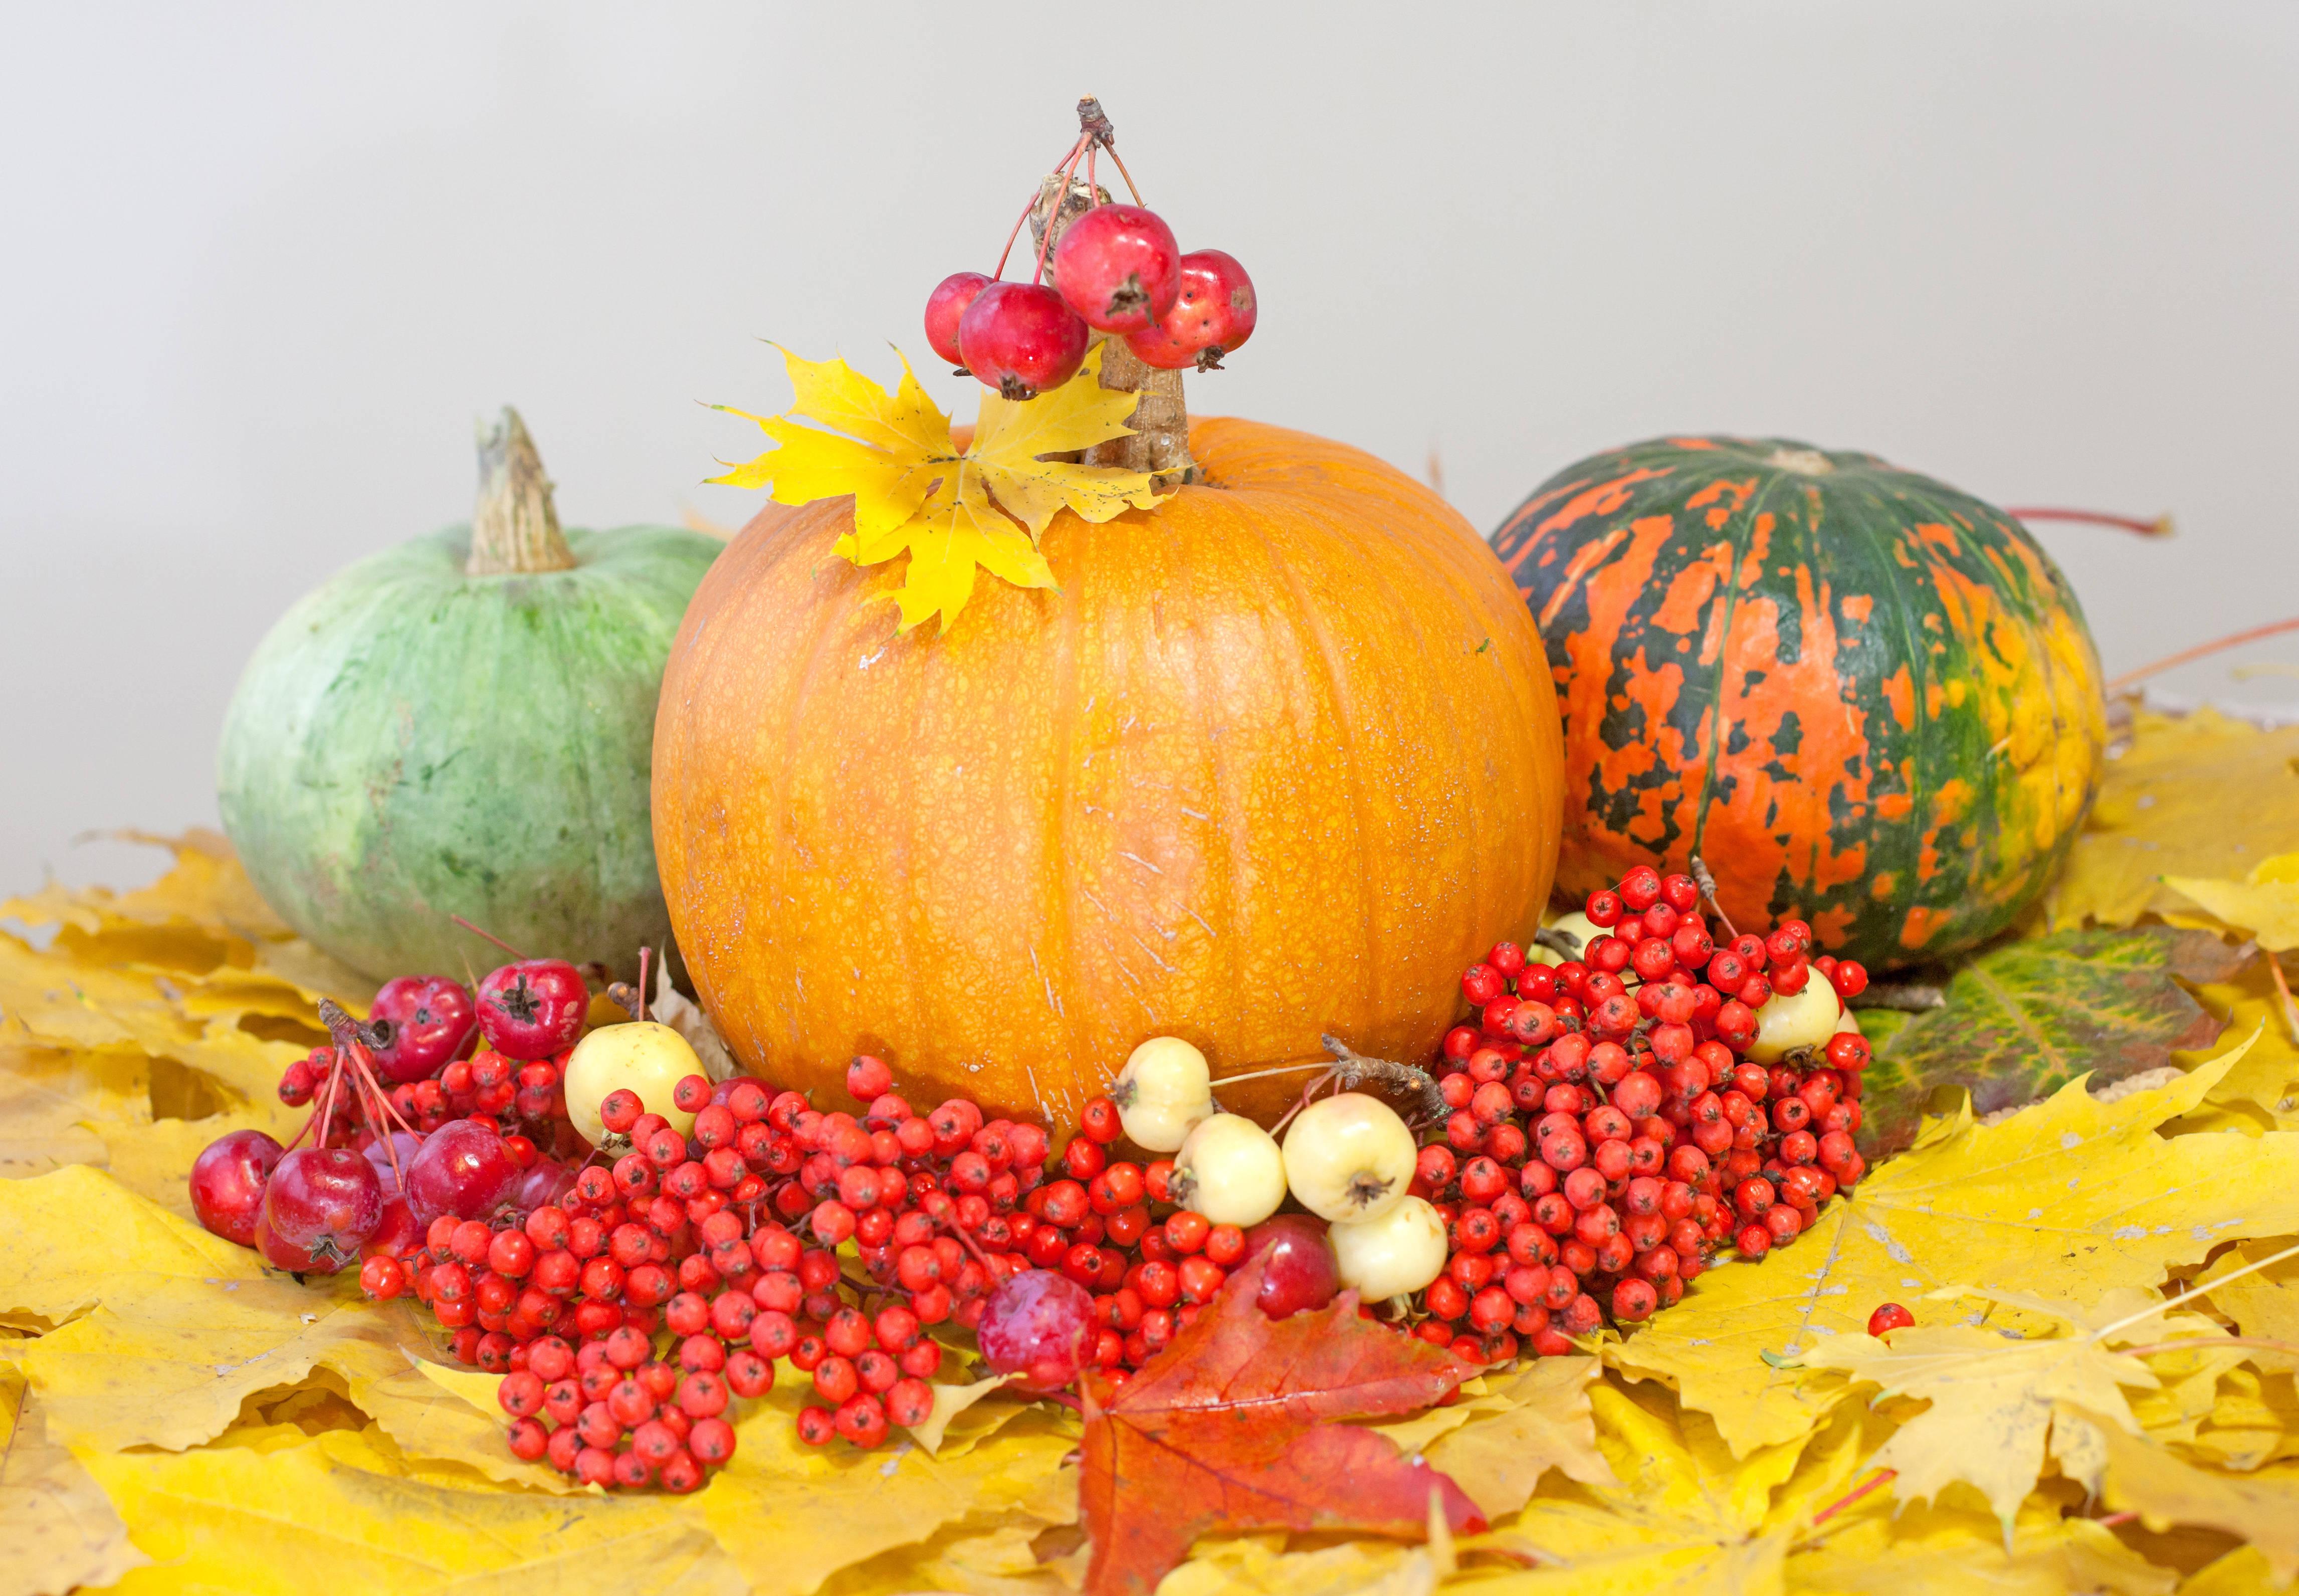 Decorating at thanksgiving using the bounty of season